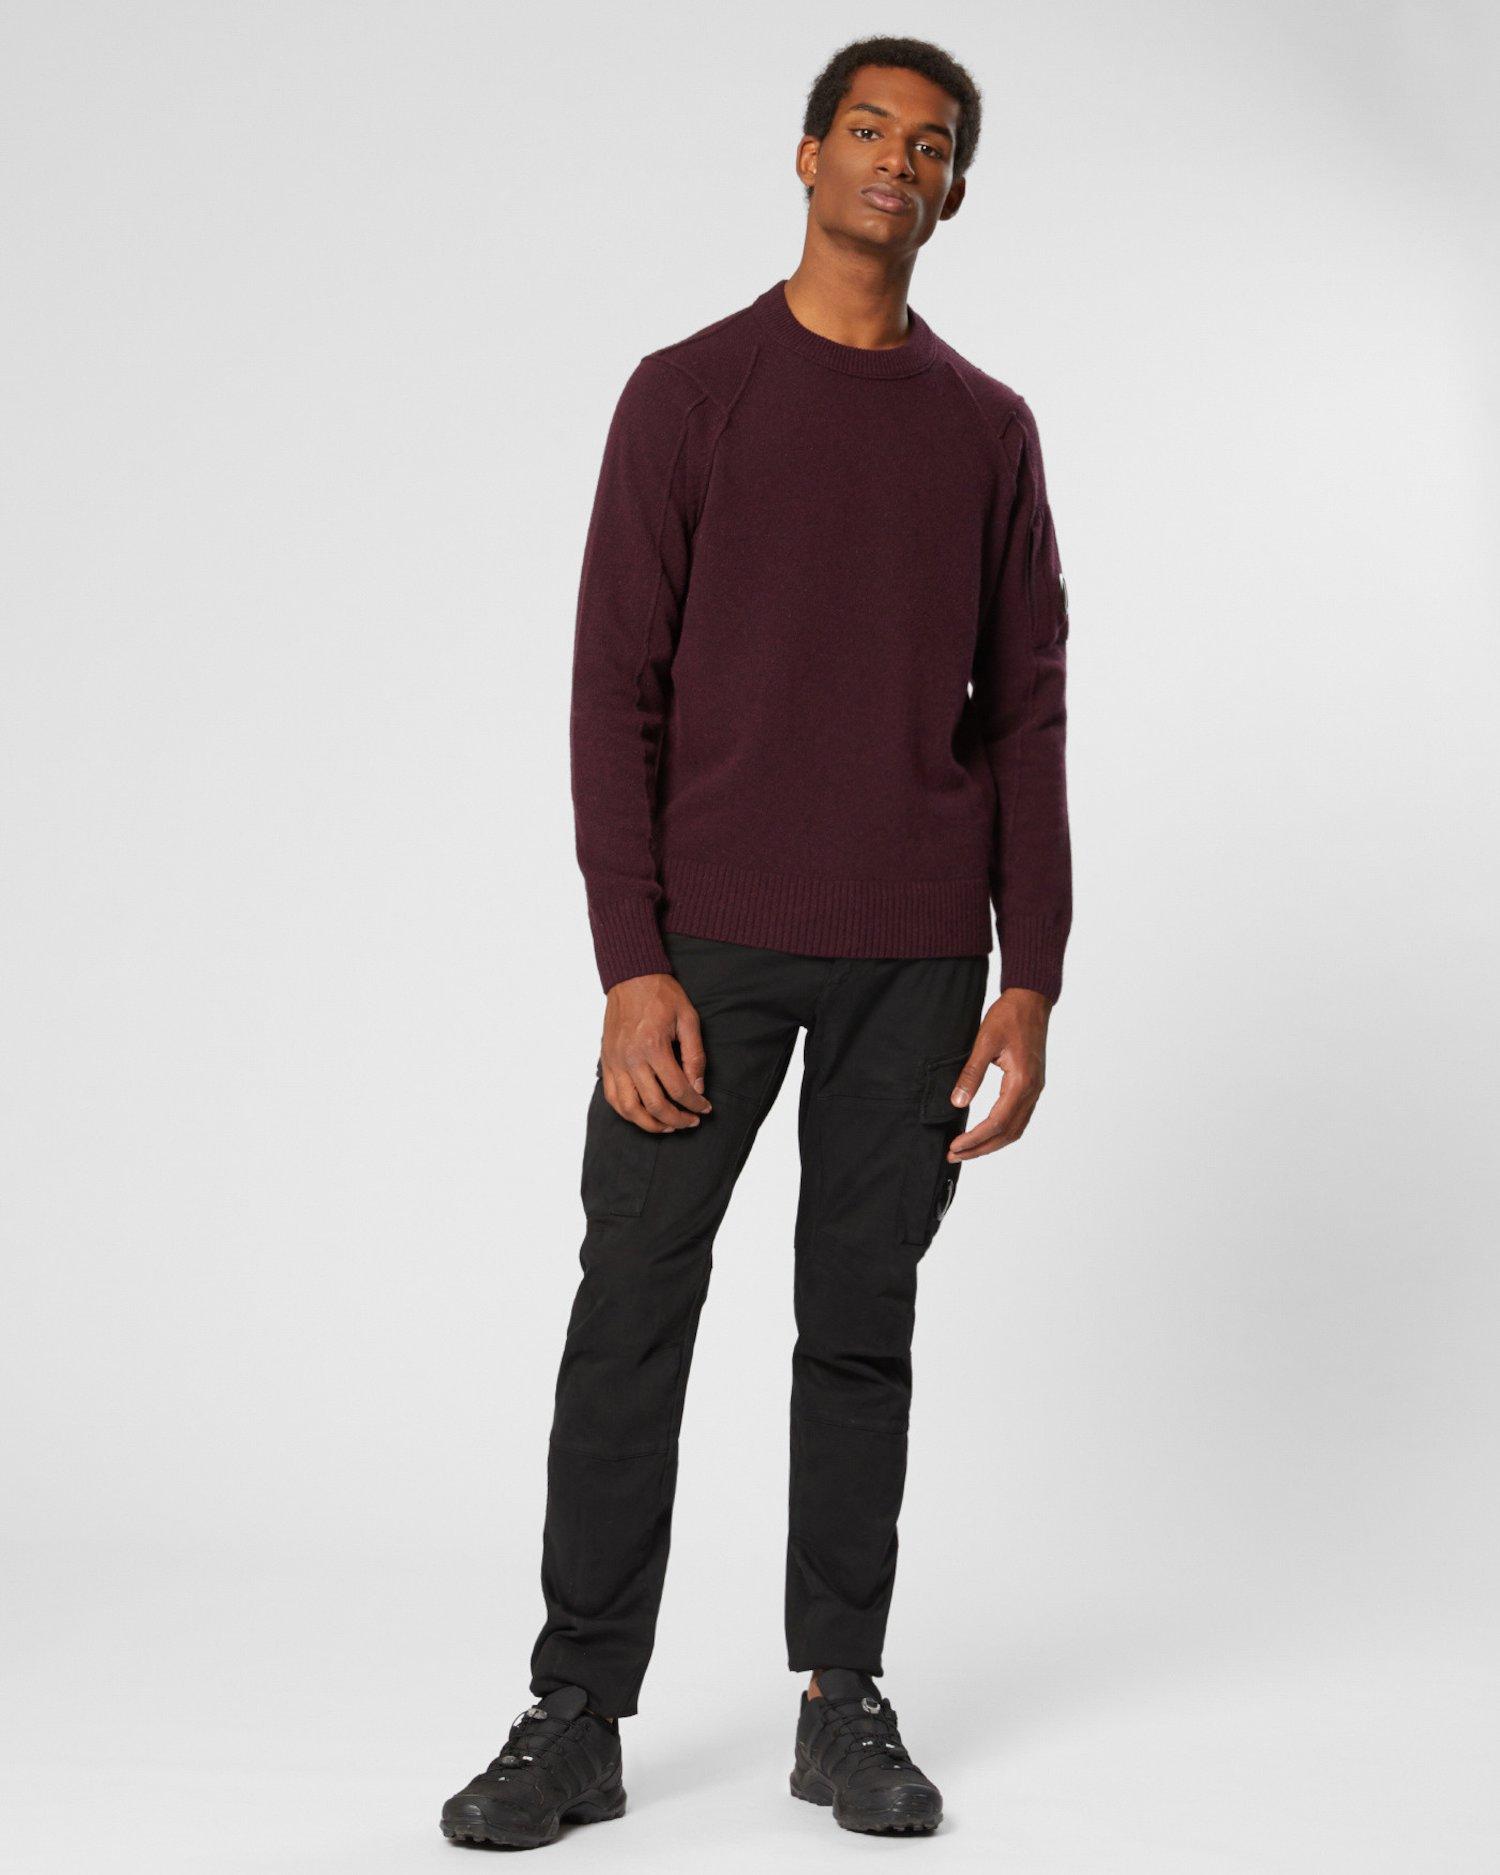 Jersey de lana con cuello redondo